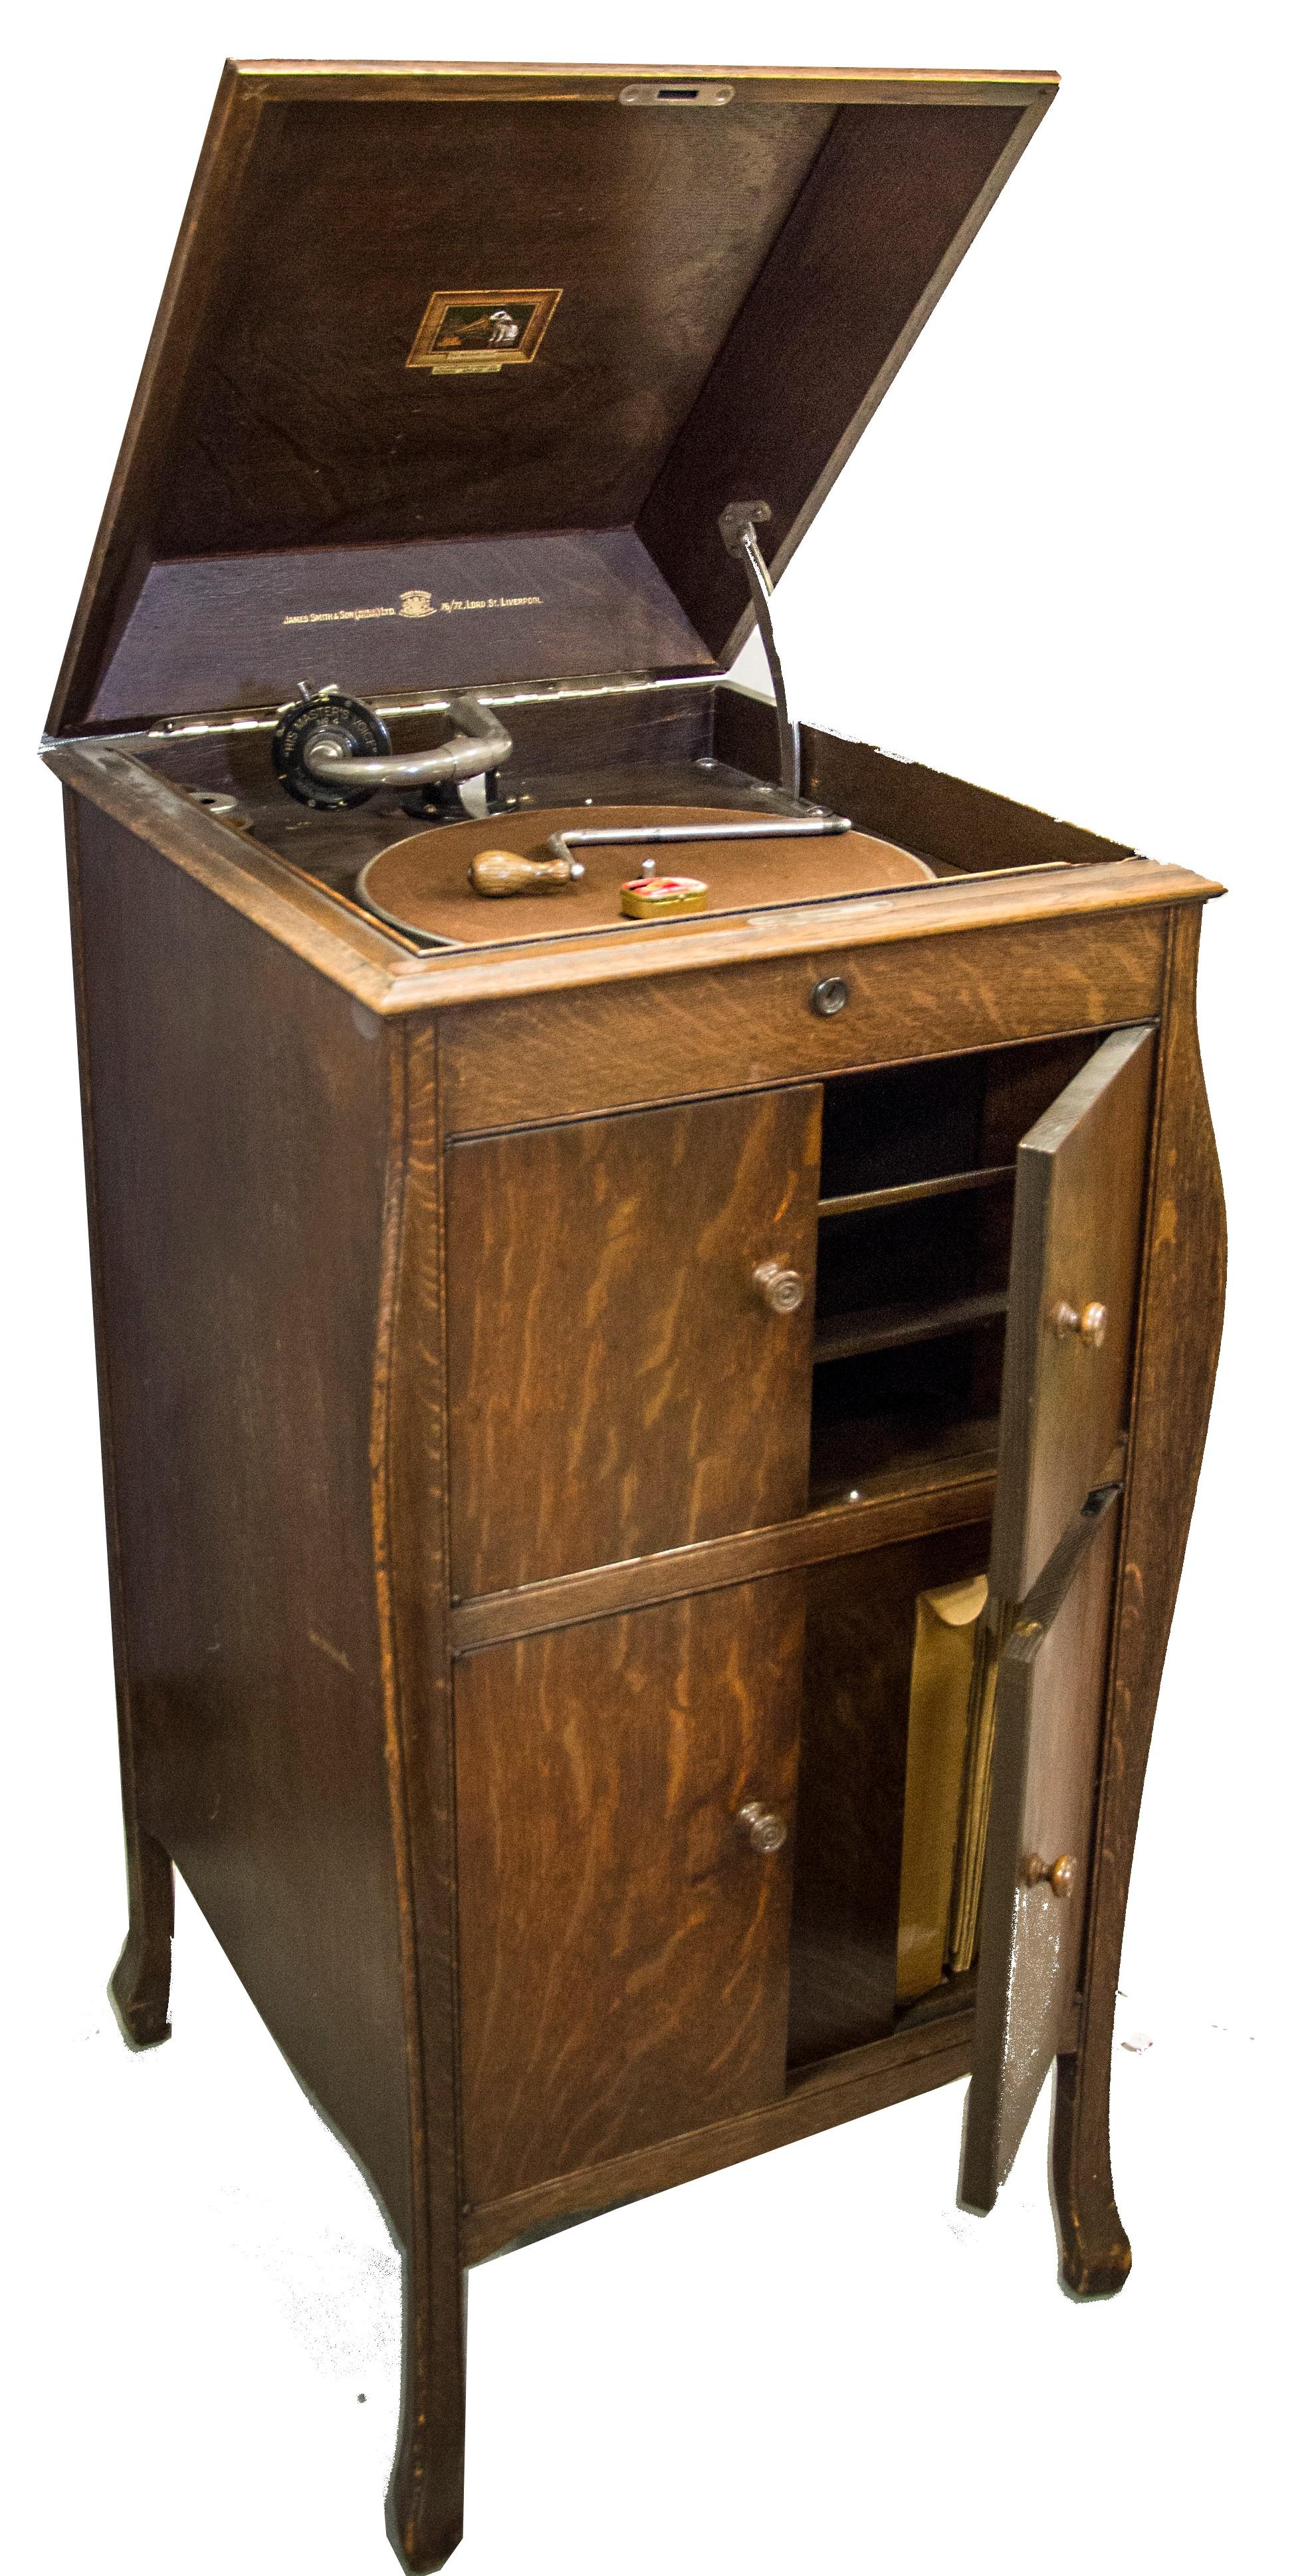 Hmv Cabinet Gramophone Model No 161 With No 4 Soundbox And